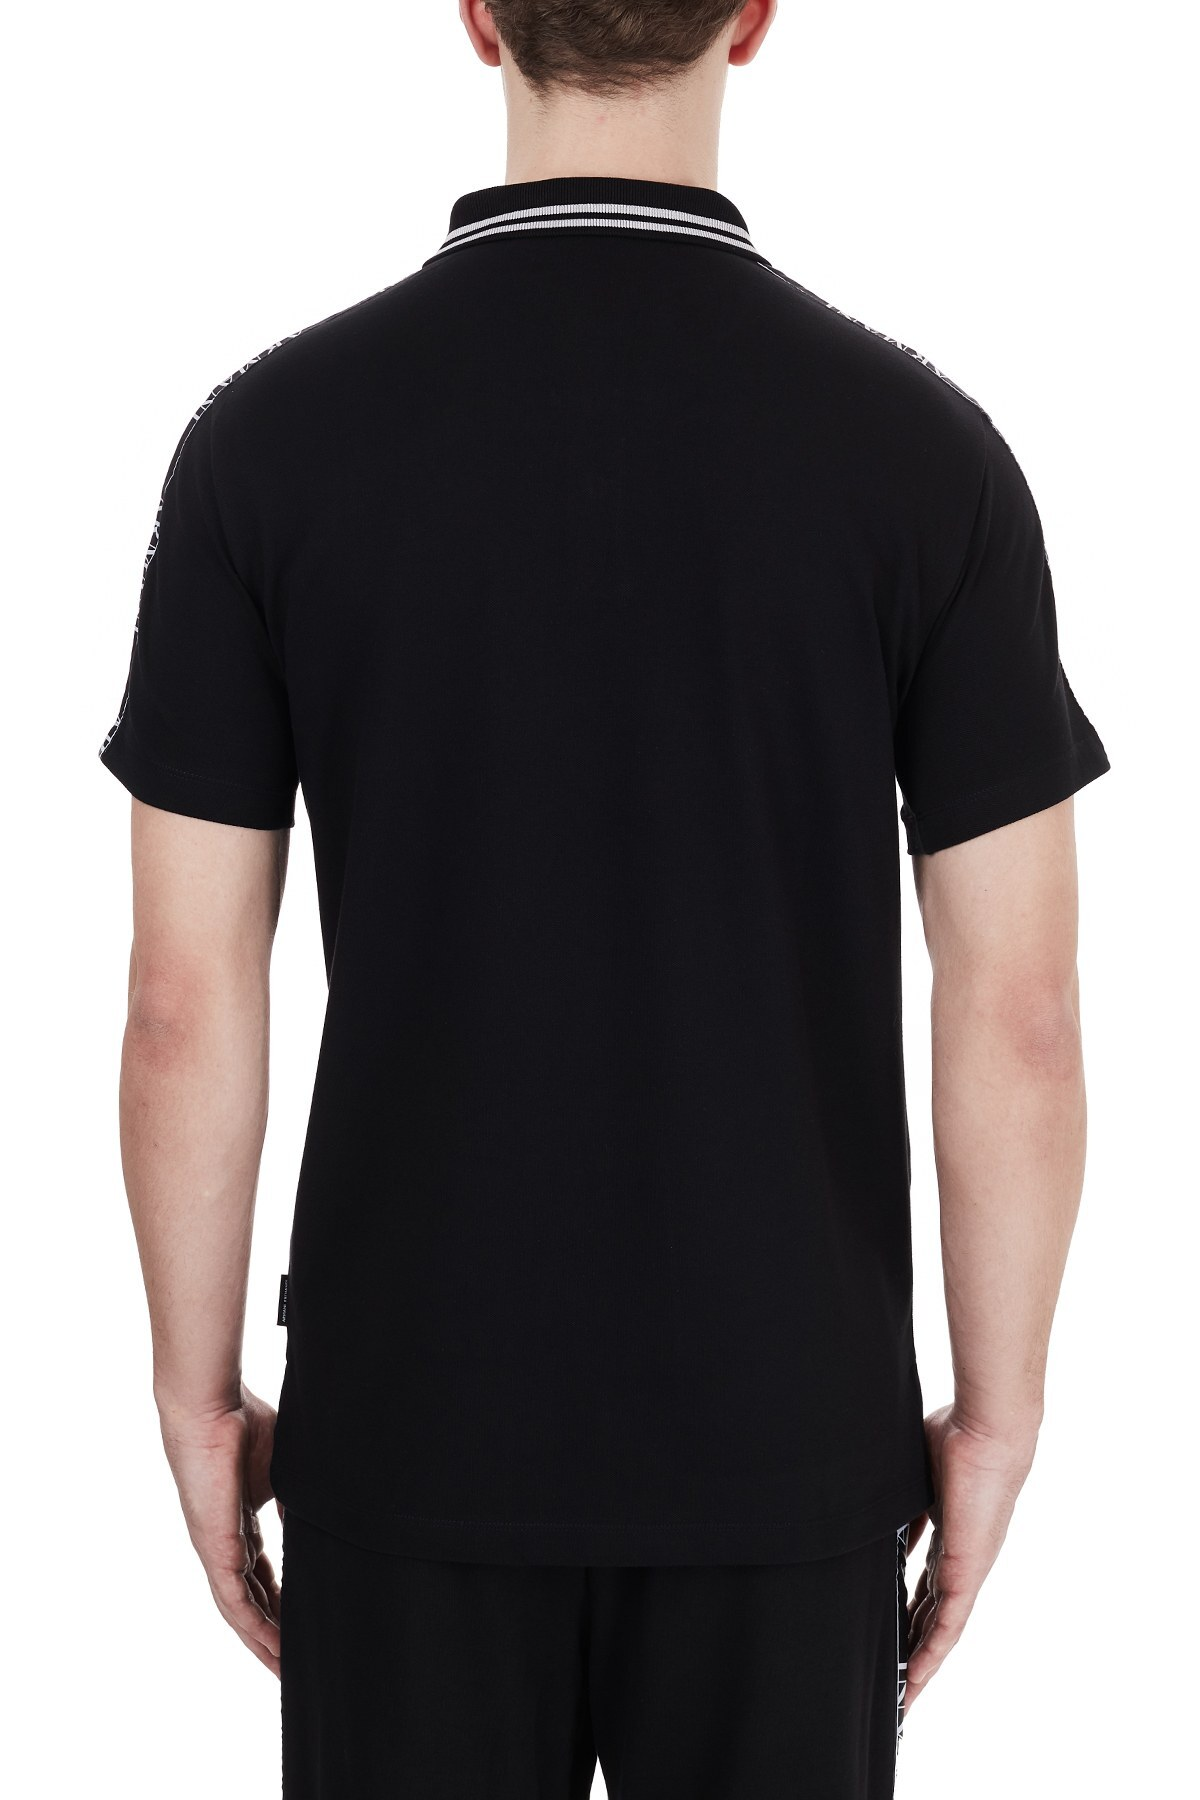 Armani Exchange Pamuklu T Shirt Erkek Polo 6HZFFF ZJU3Z 1200 SİYAH